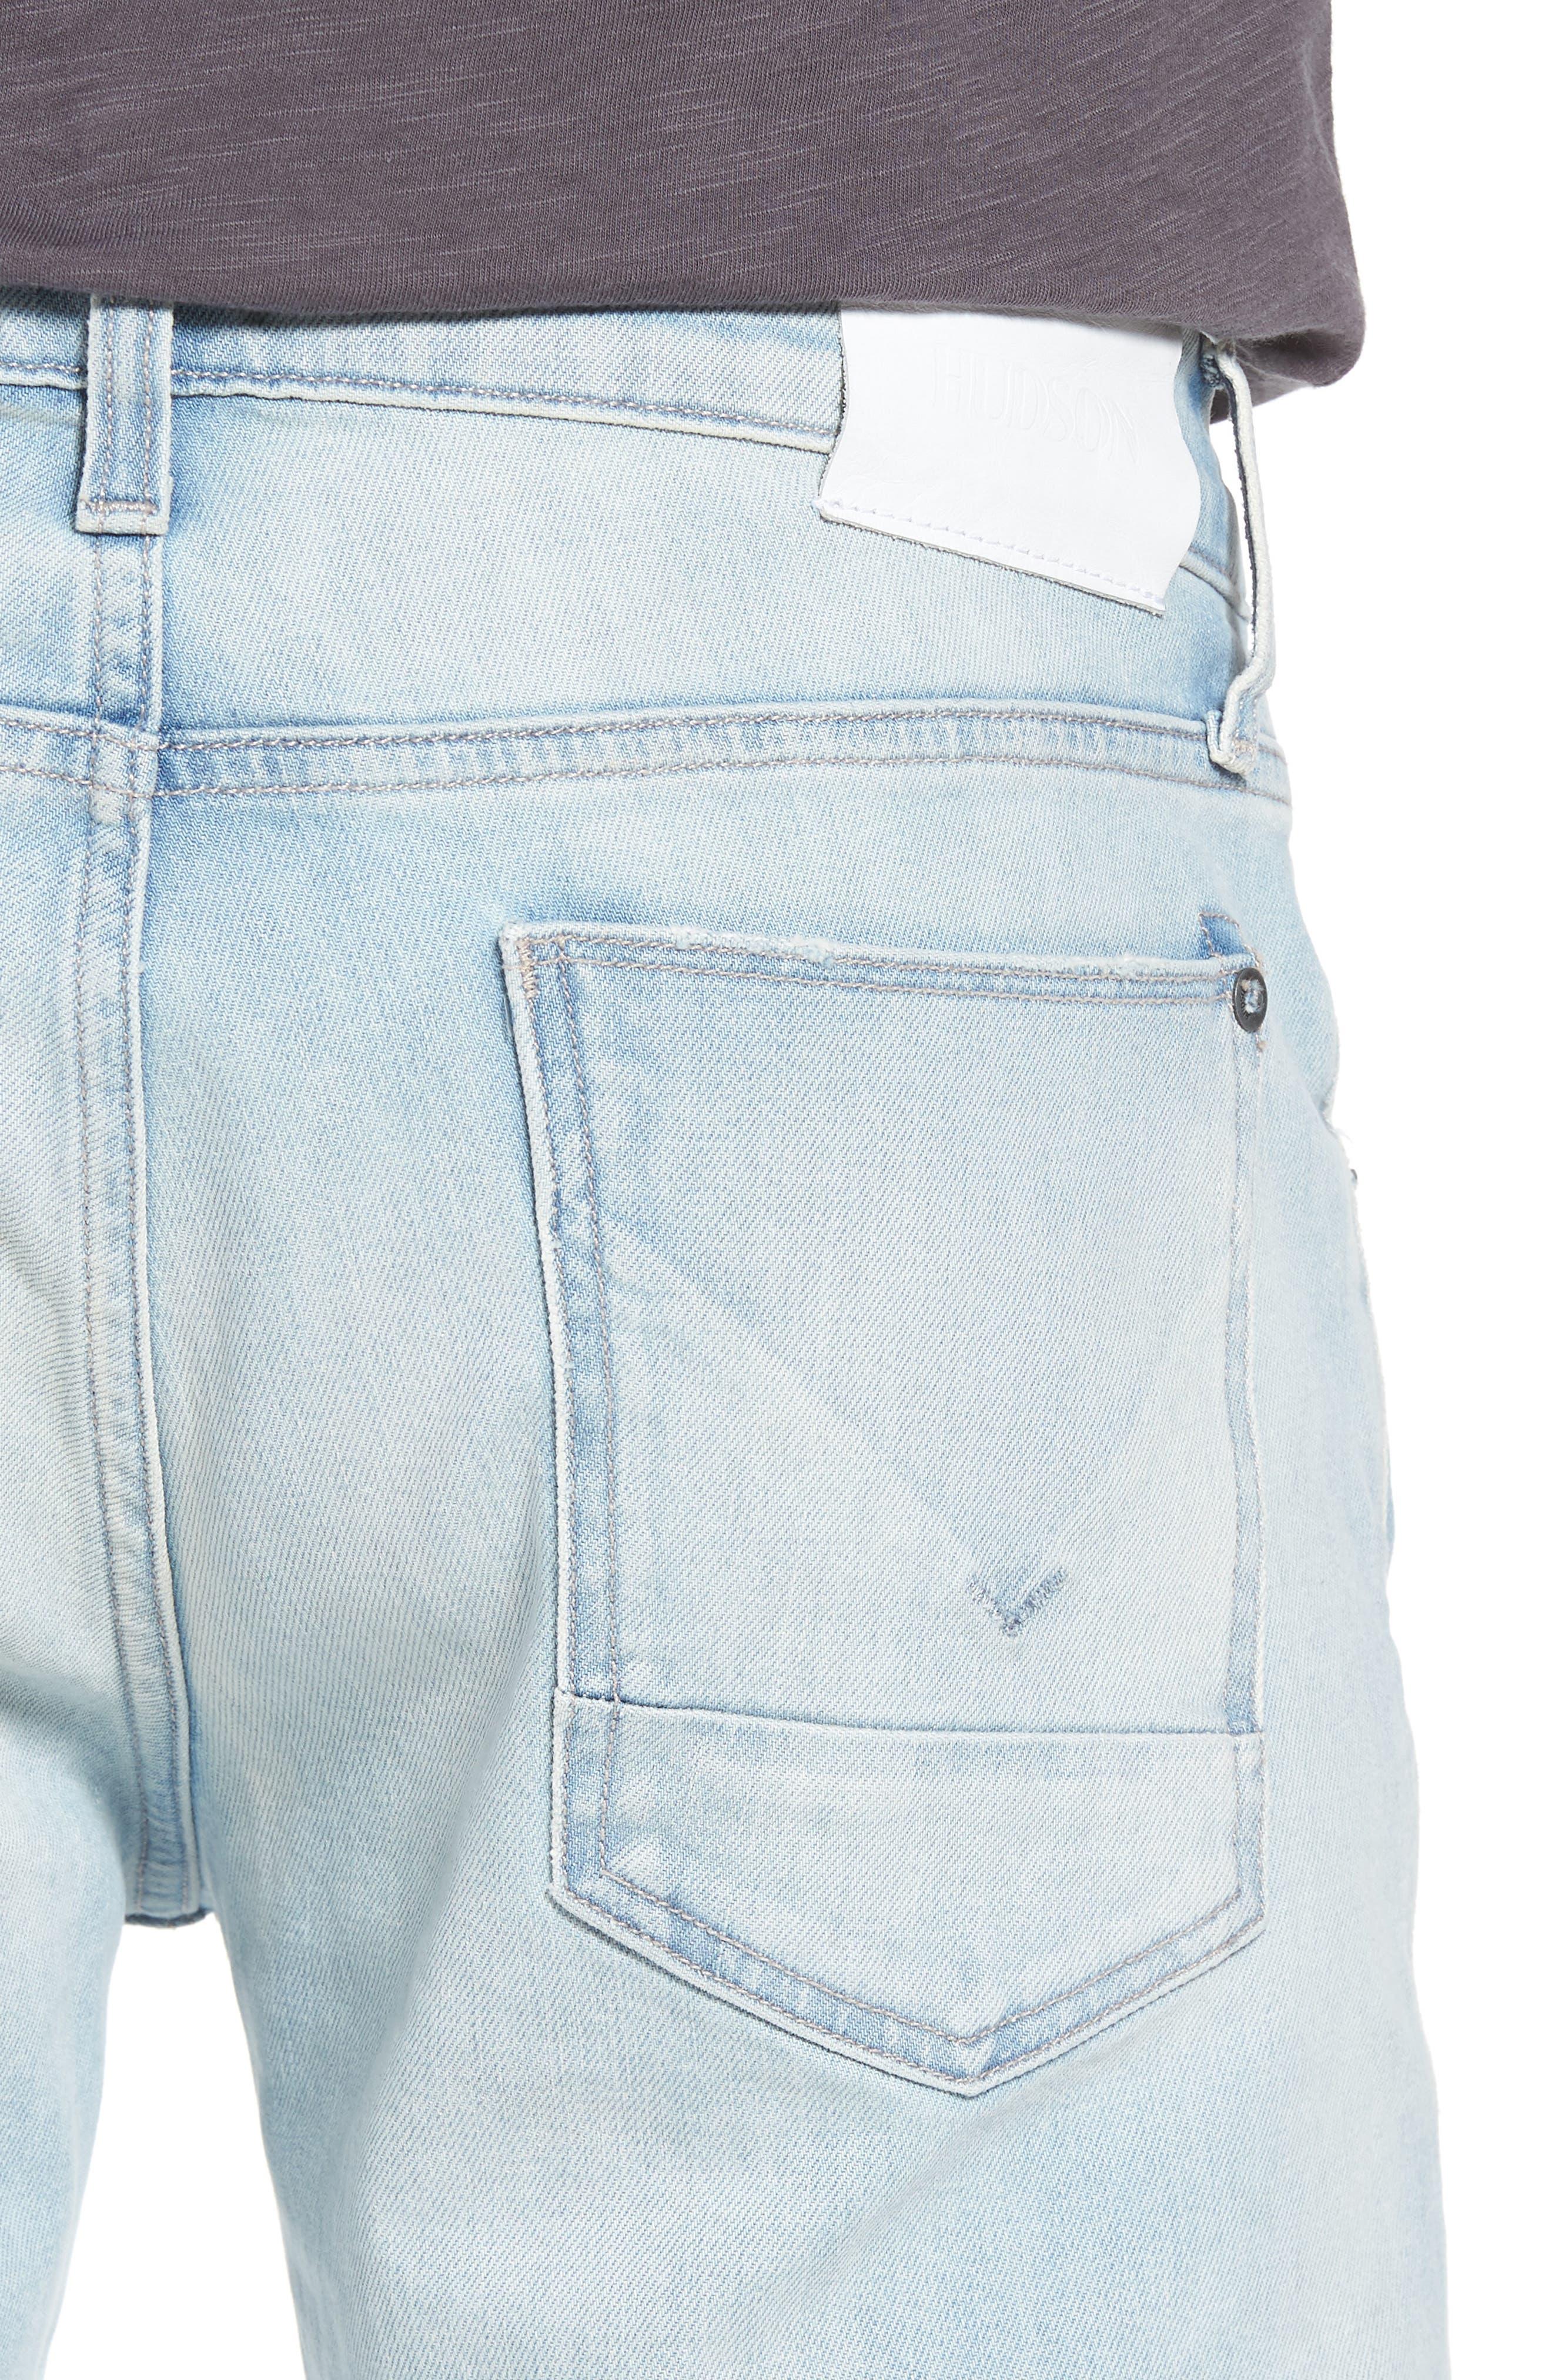 Blake Slim Fit Jeans,                             Alternate thumbnail 4, color,                             Rewired